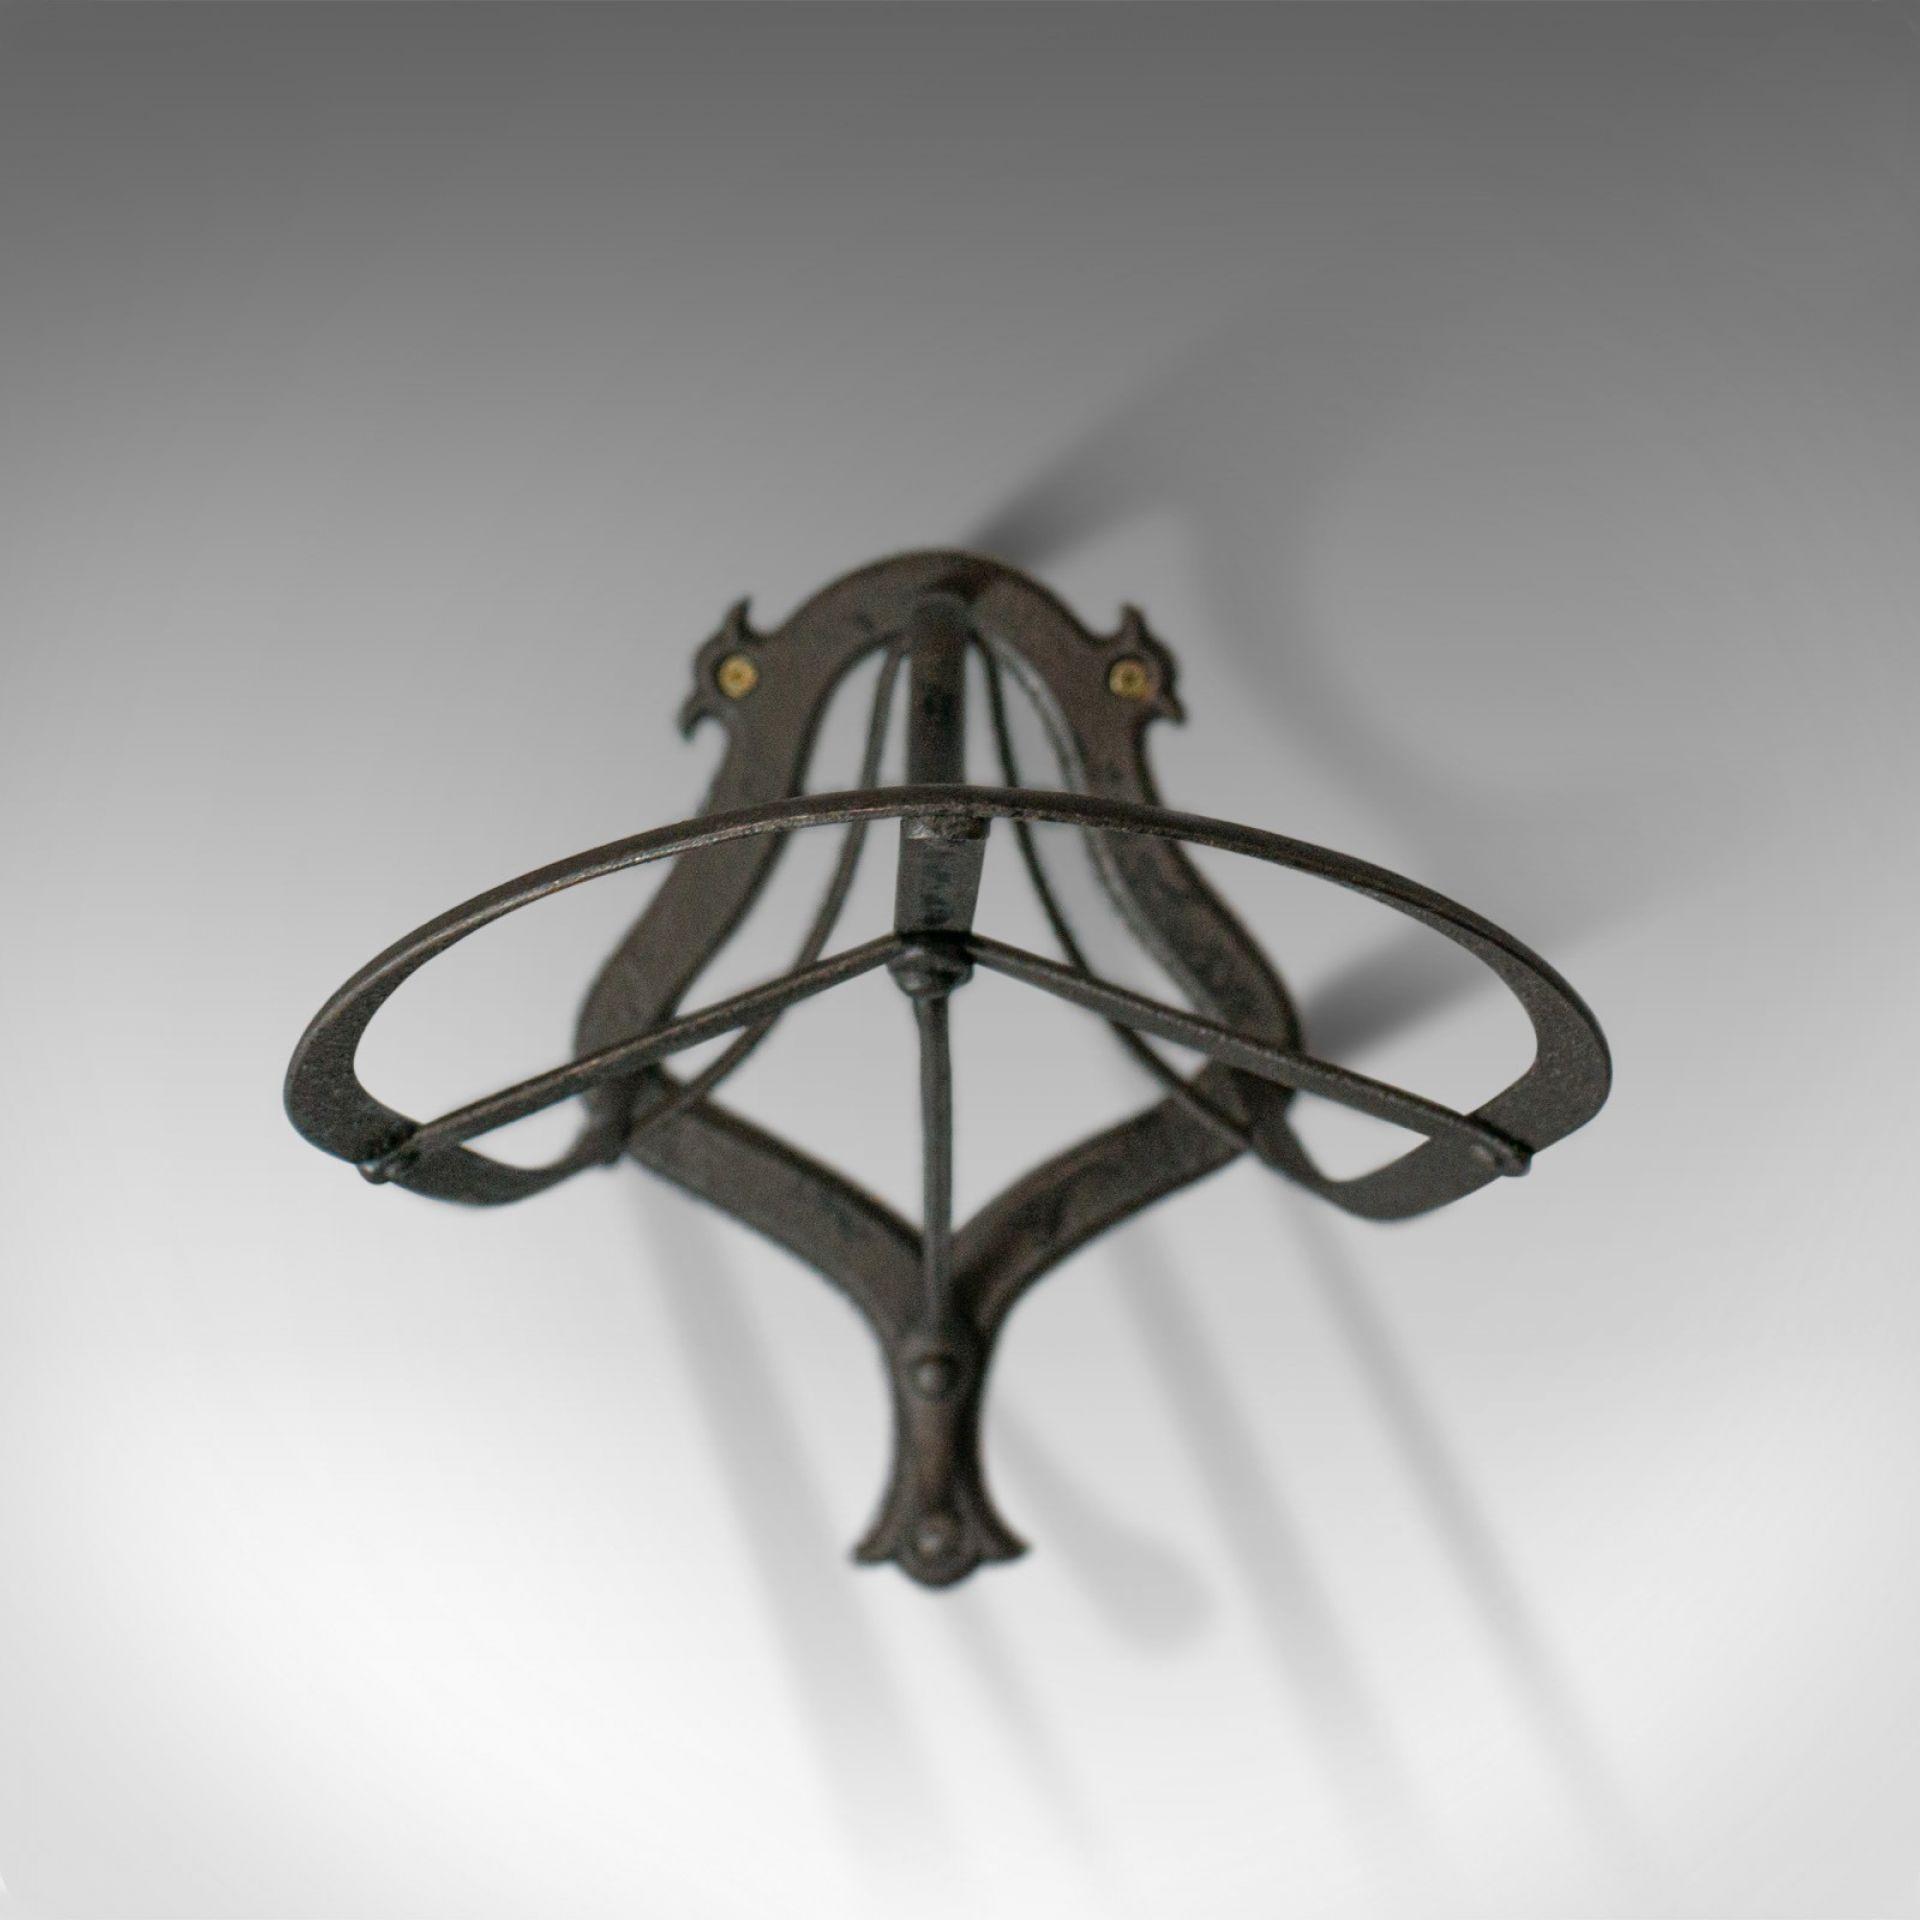 Antique Saddle Rack, English, Victorian, Wall Mounted, Forged Iron, Circa 1900